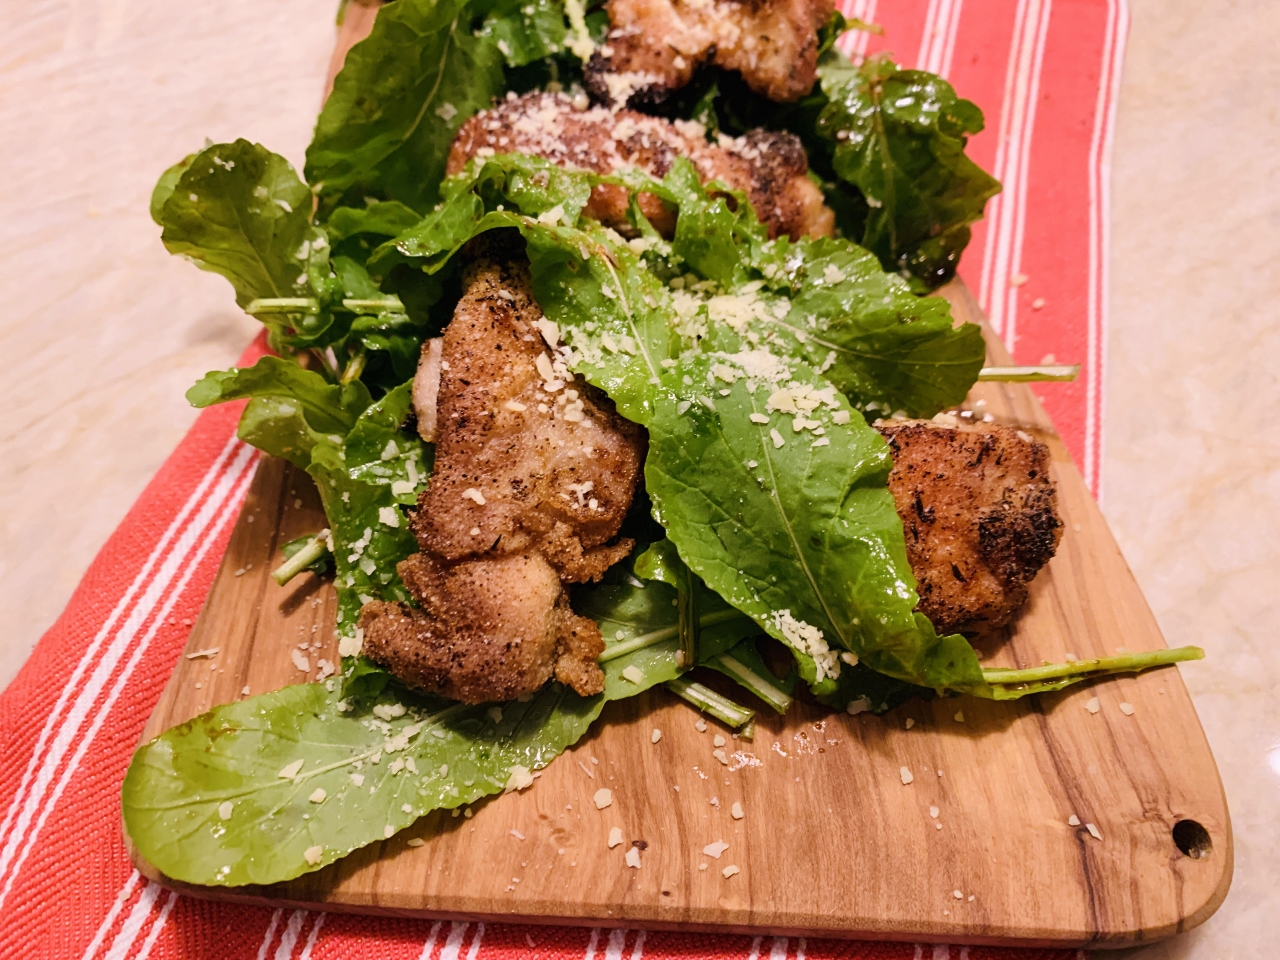 Crispy Chicken, Arugula, Parmesan, Balsamic Image 2